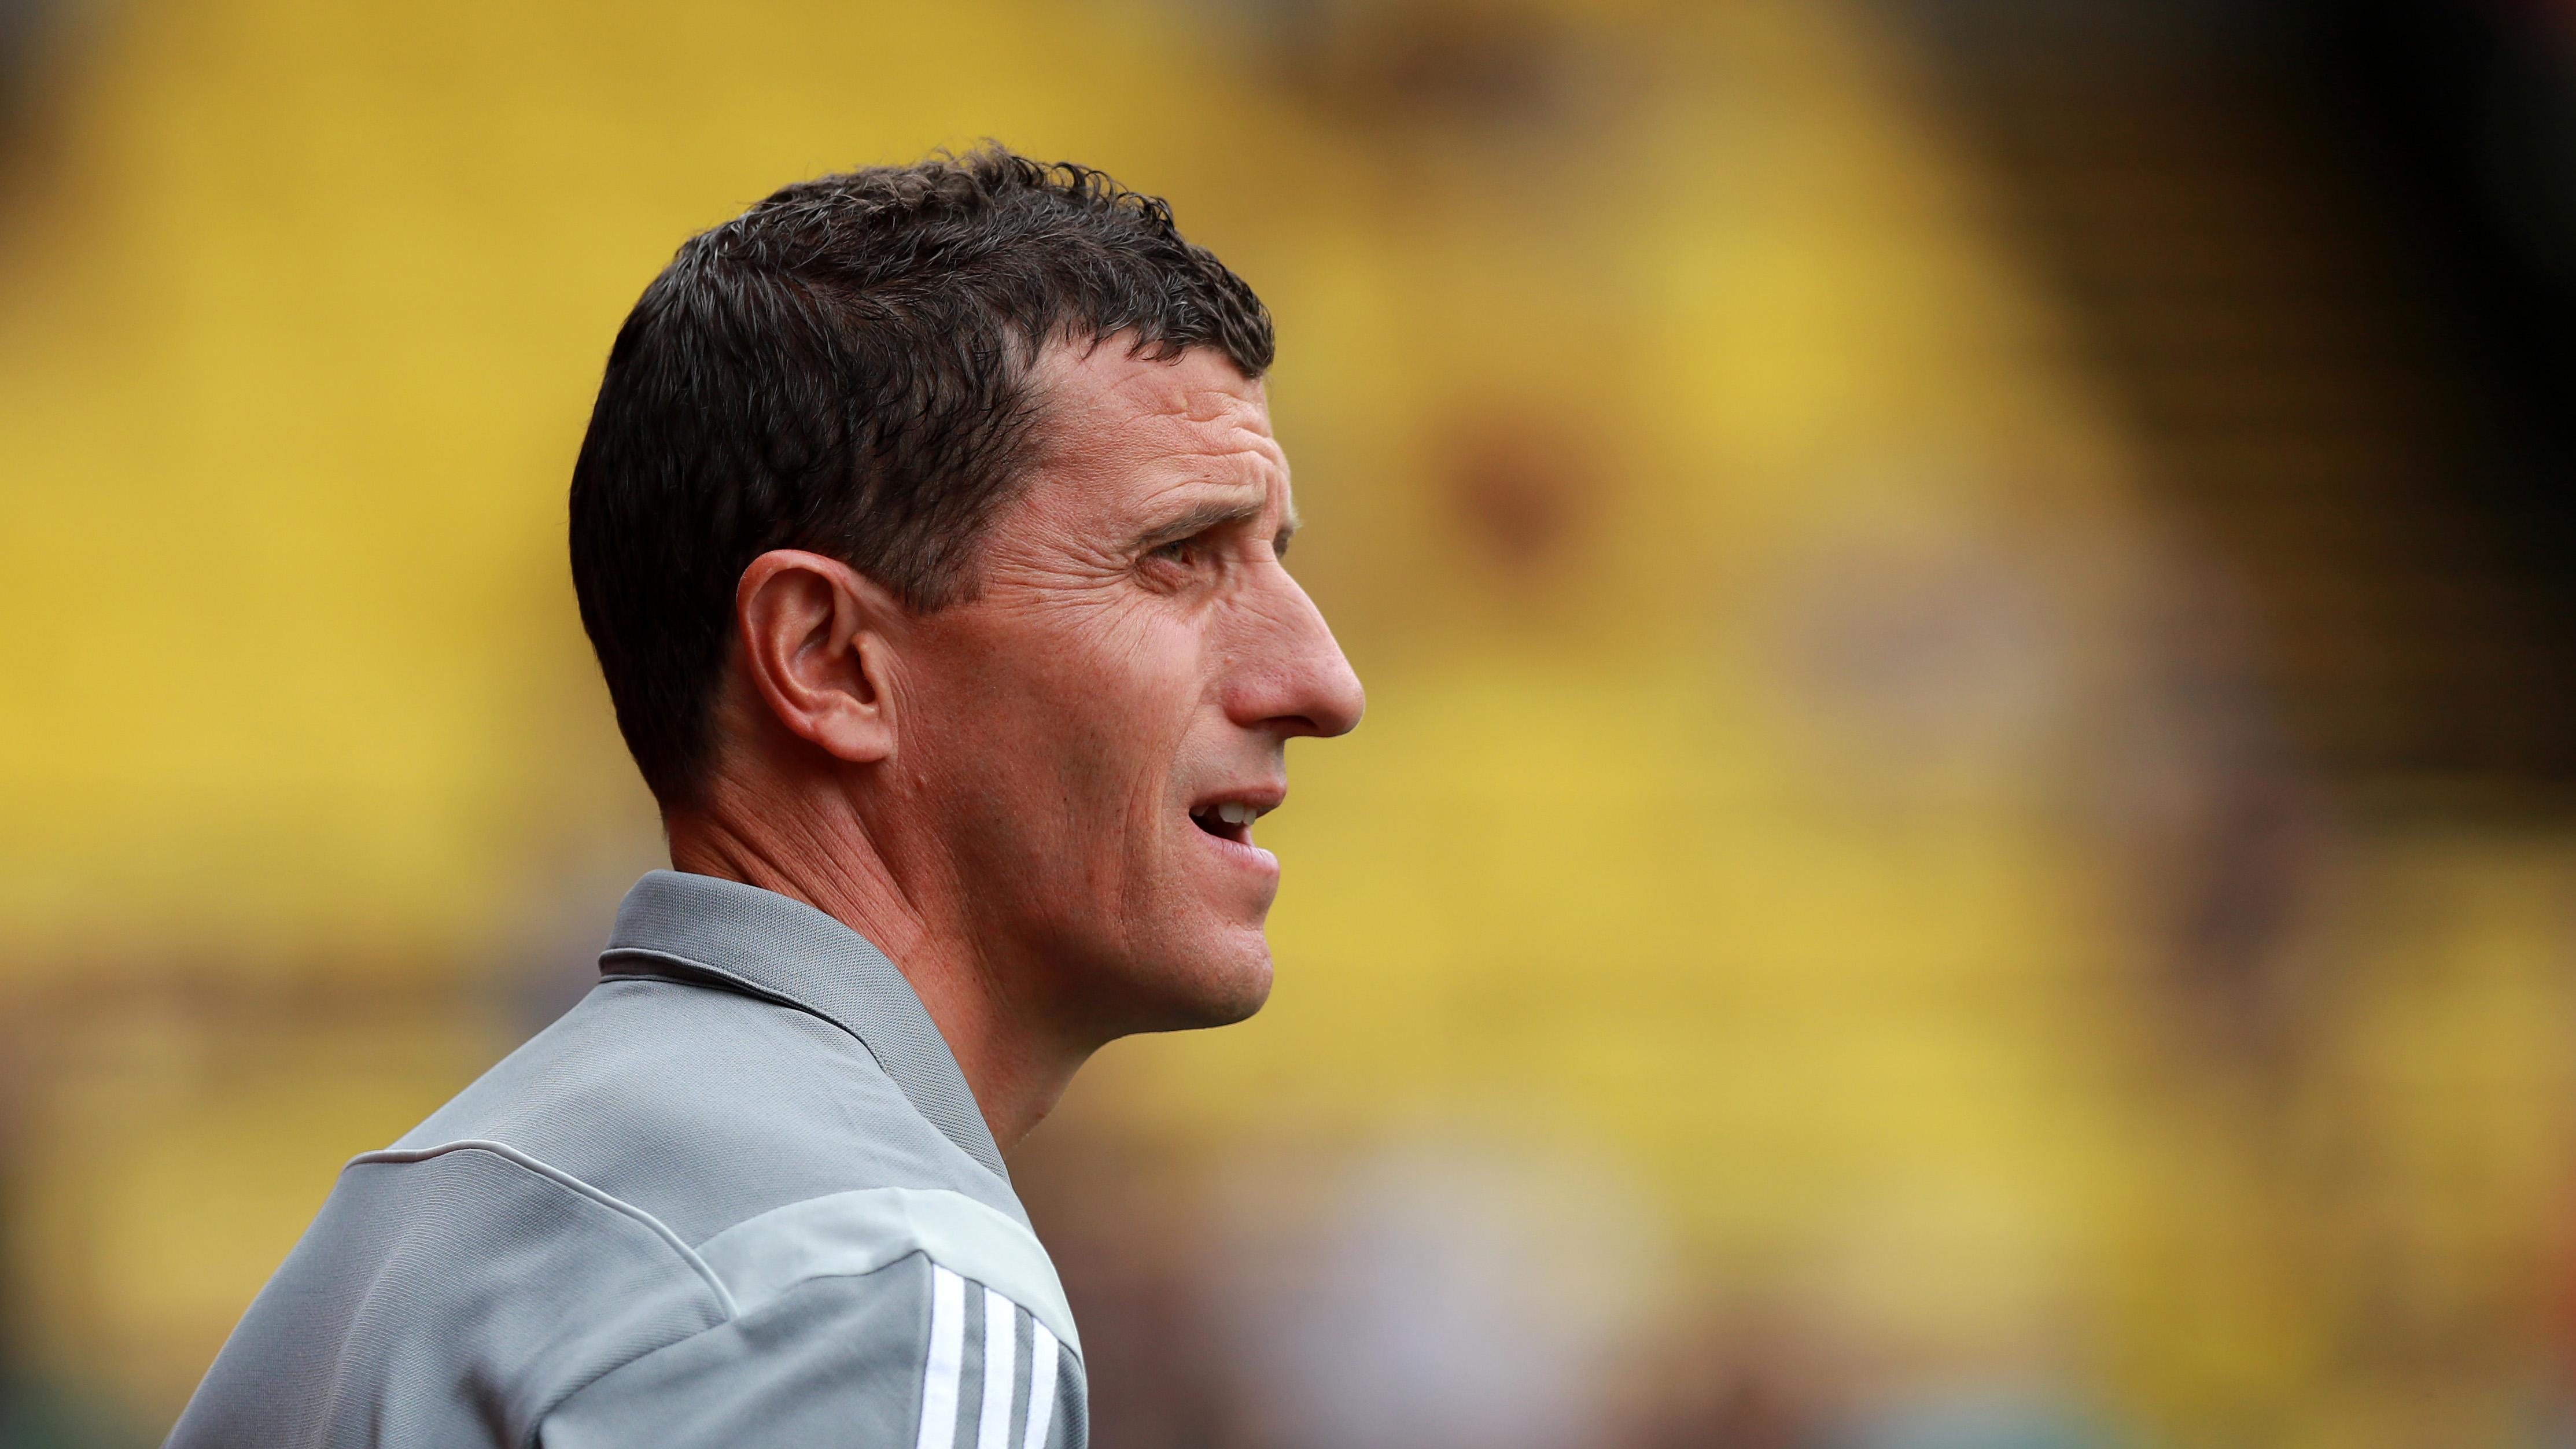 Javi Gracia on hot seat? Anthony Martial next up for Man Utd